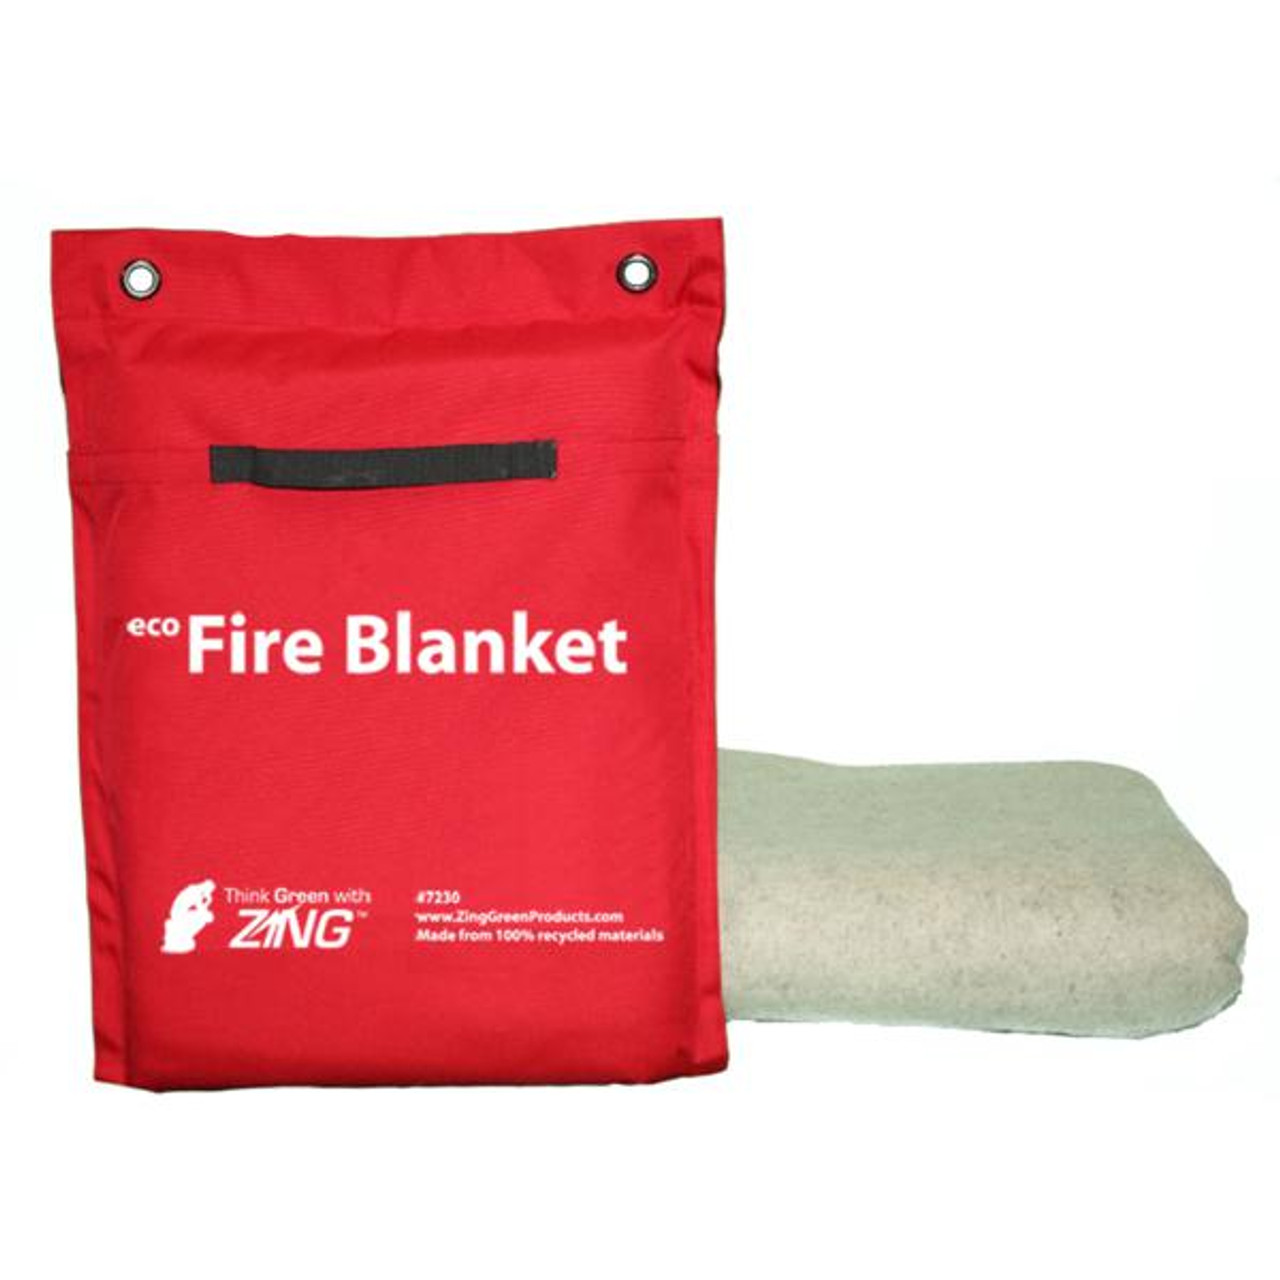 Eco Fire Blanket - Tote Set